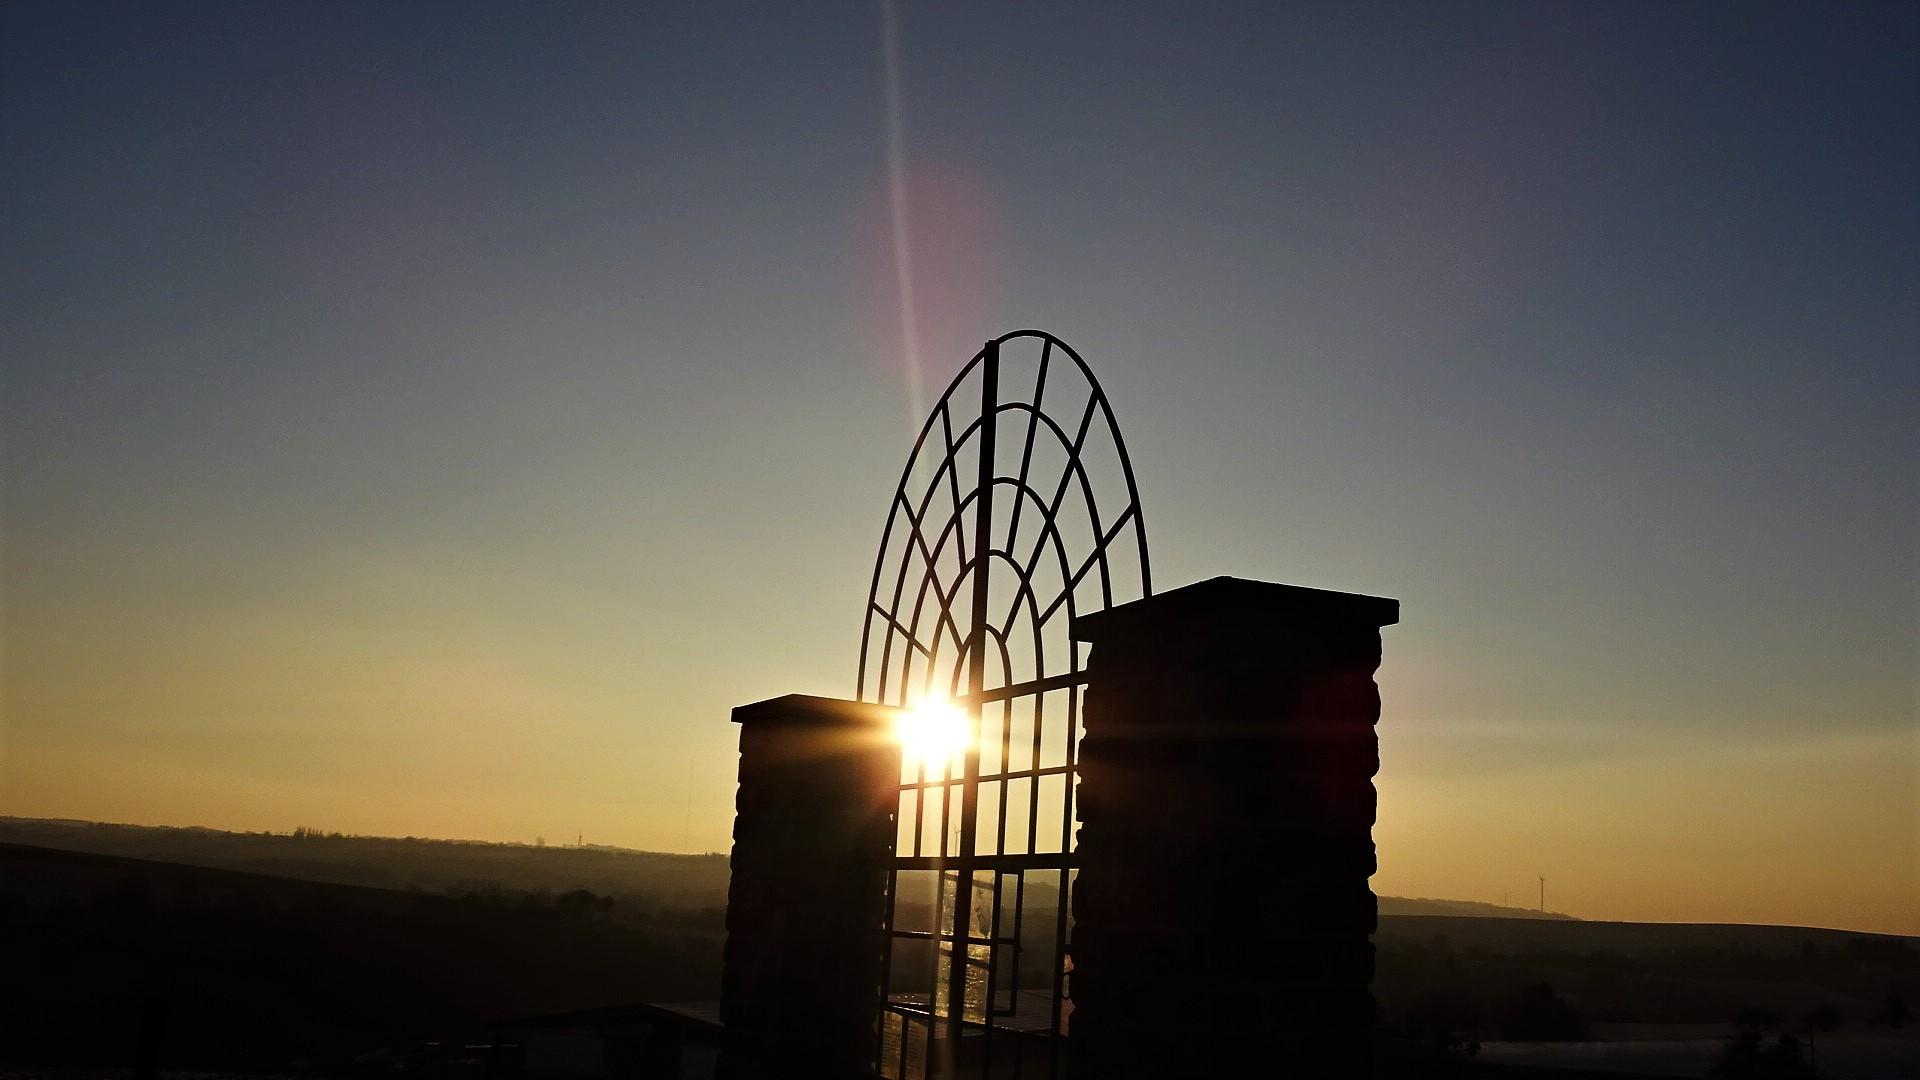 Sonnenaufgang am Grenzblickfenster in Leidingen